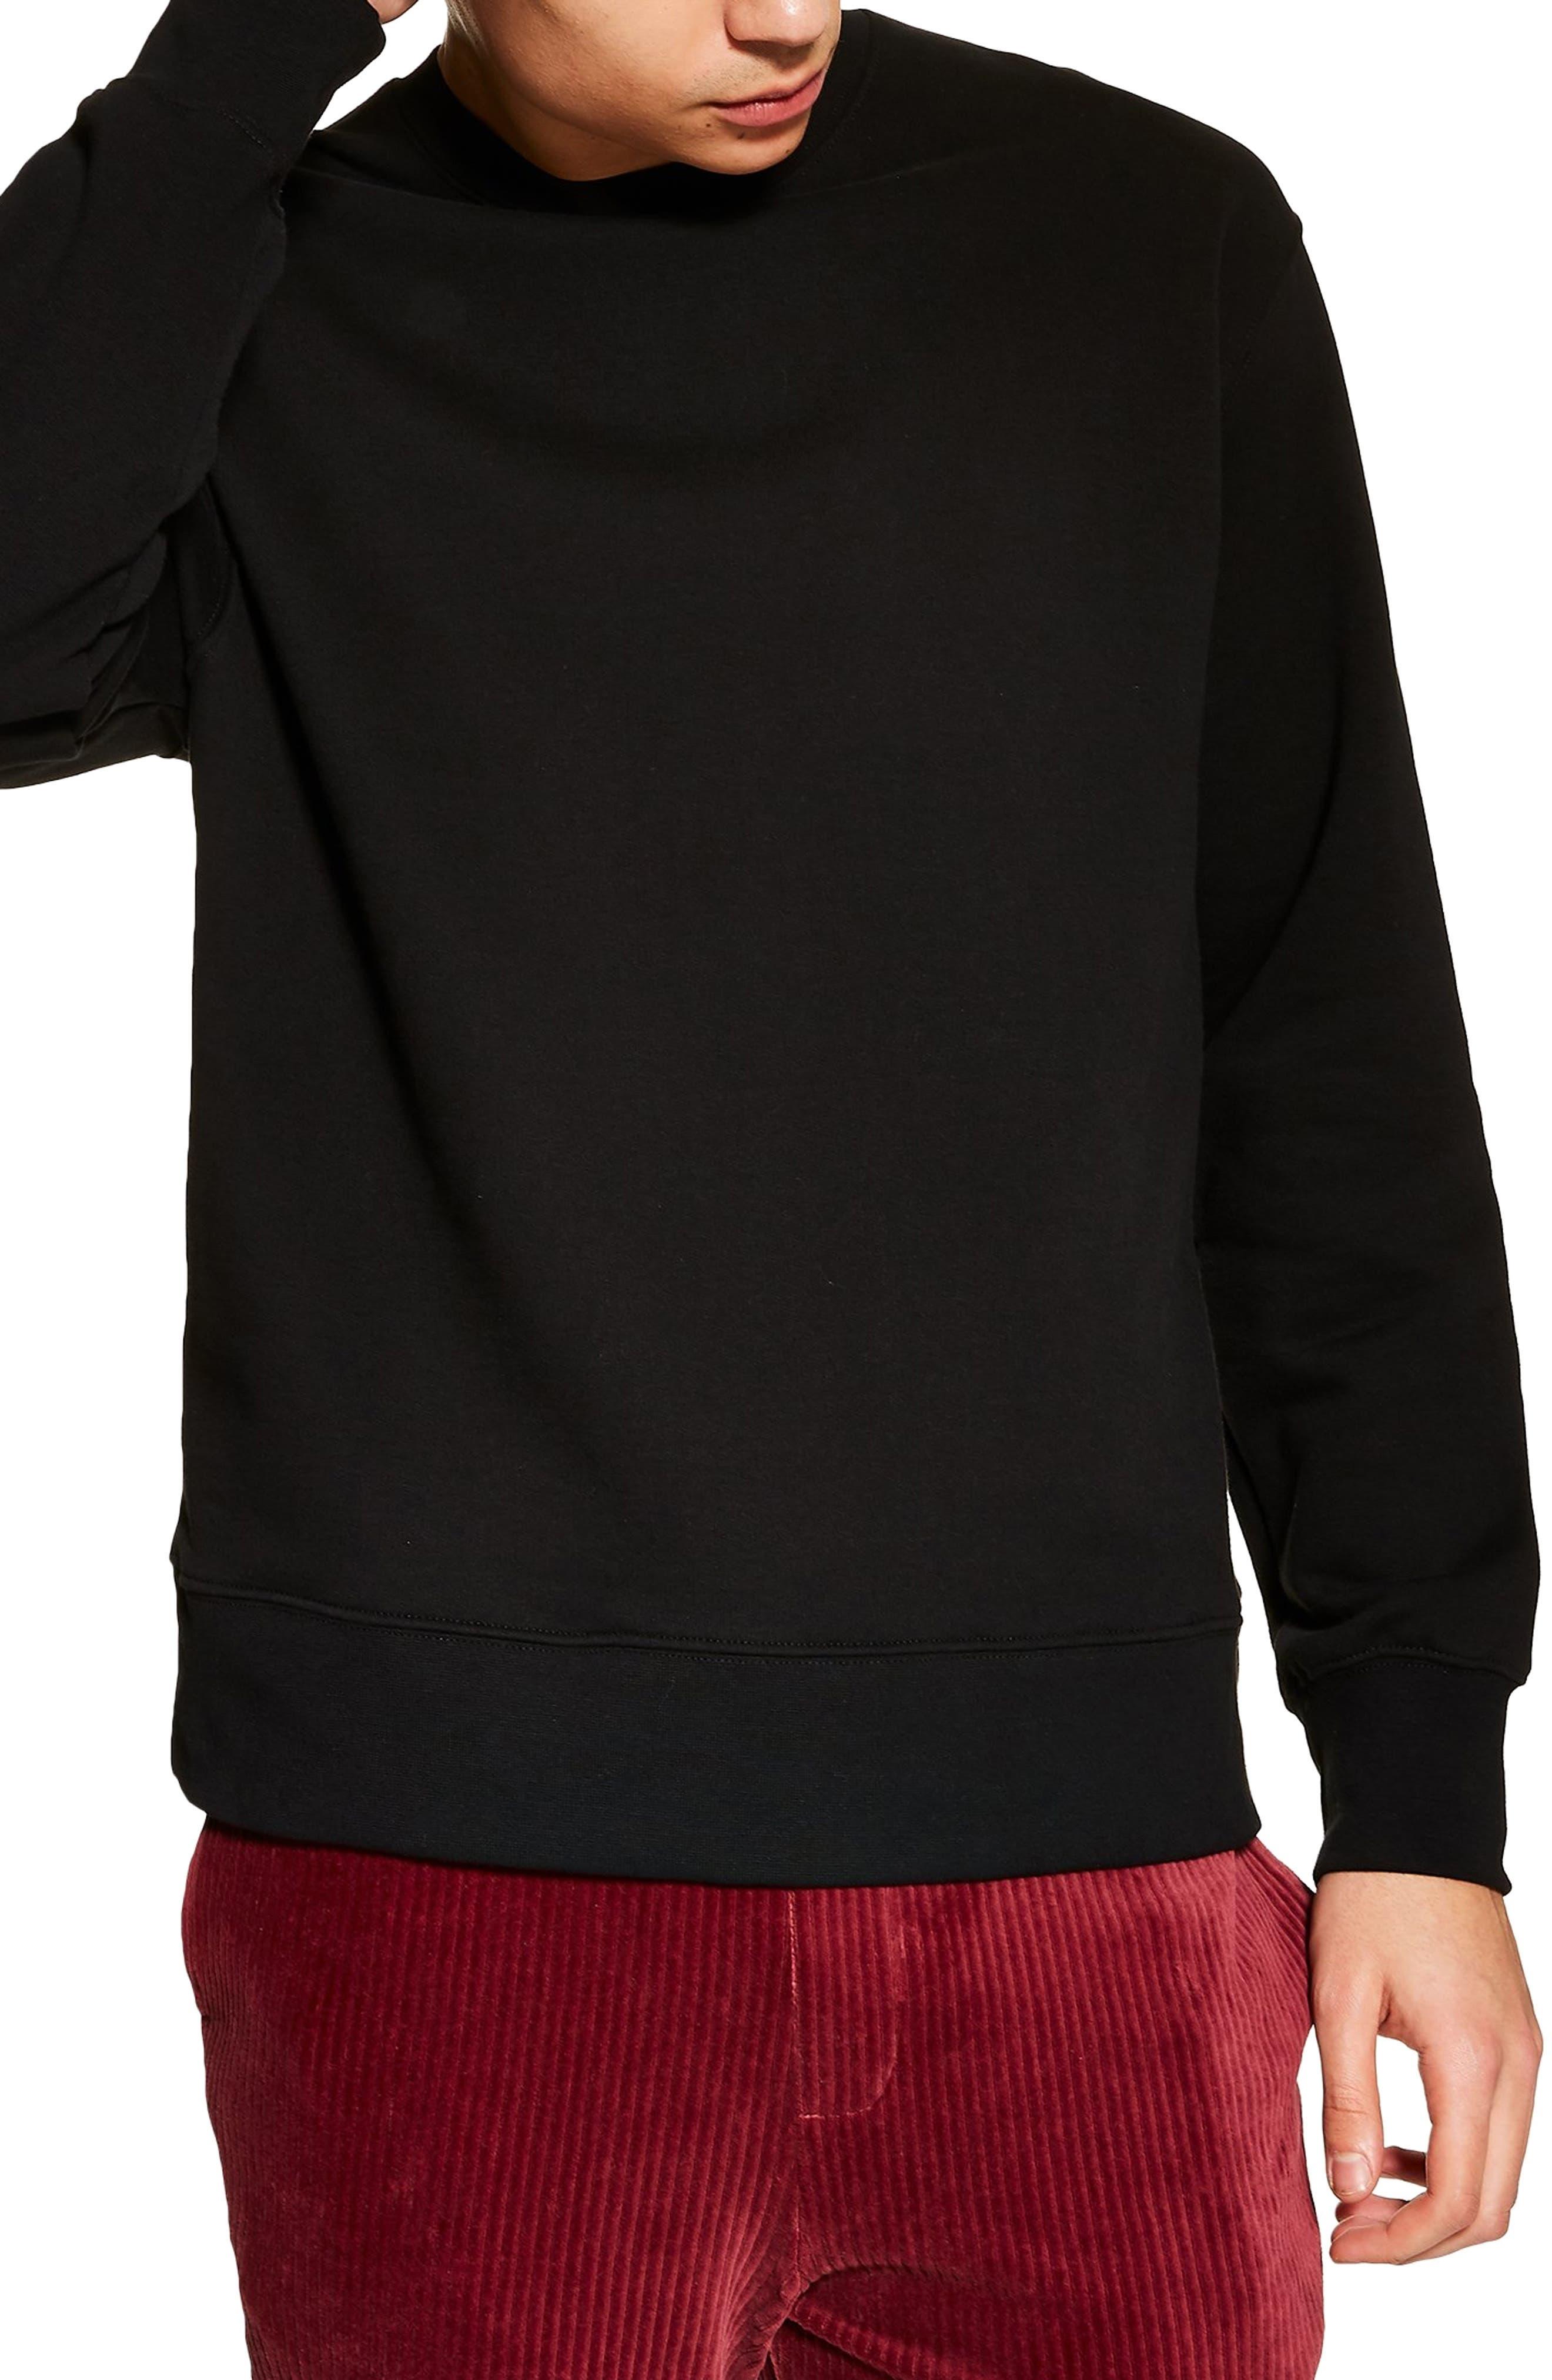 TOPMAN, Crewneck Sweatshirt, Main thumbnail 1, color, BLACK